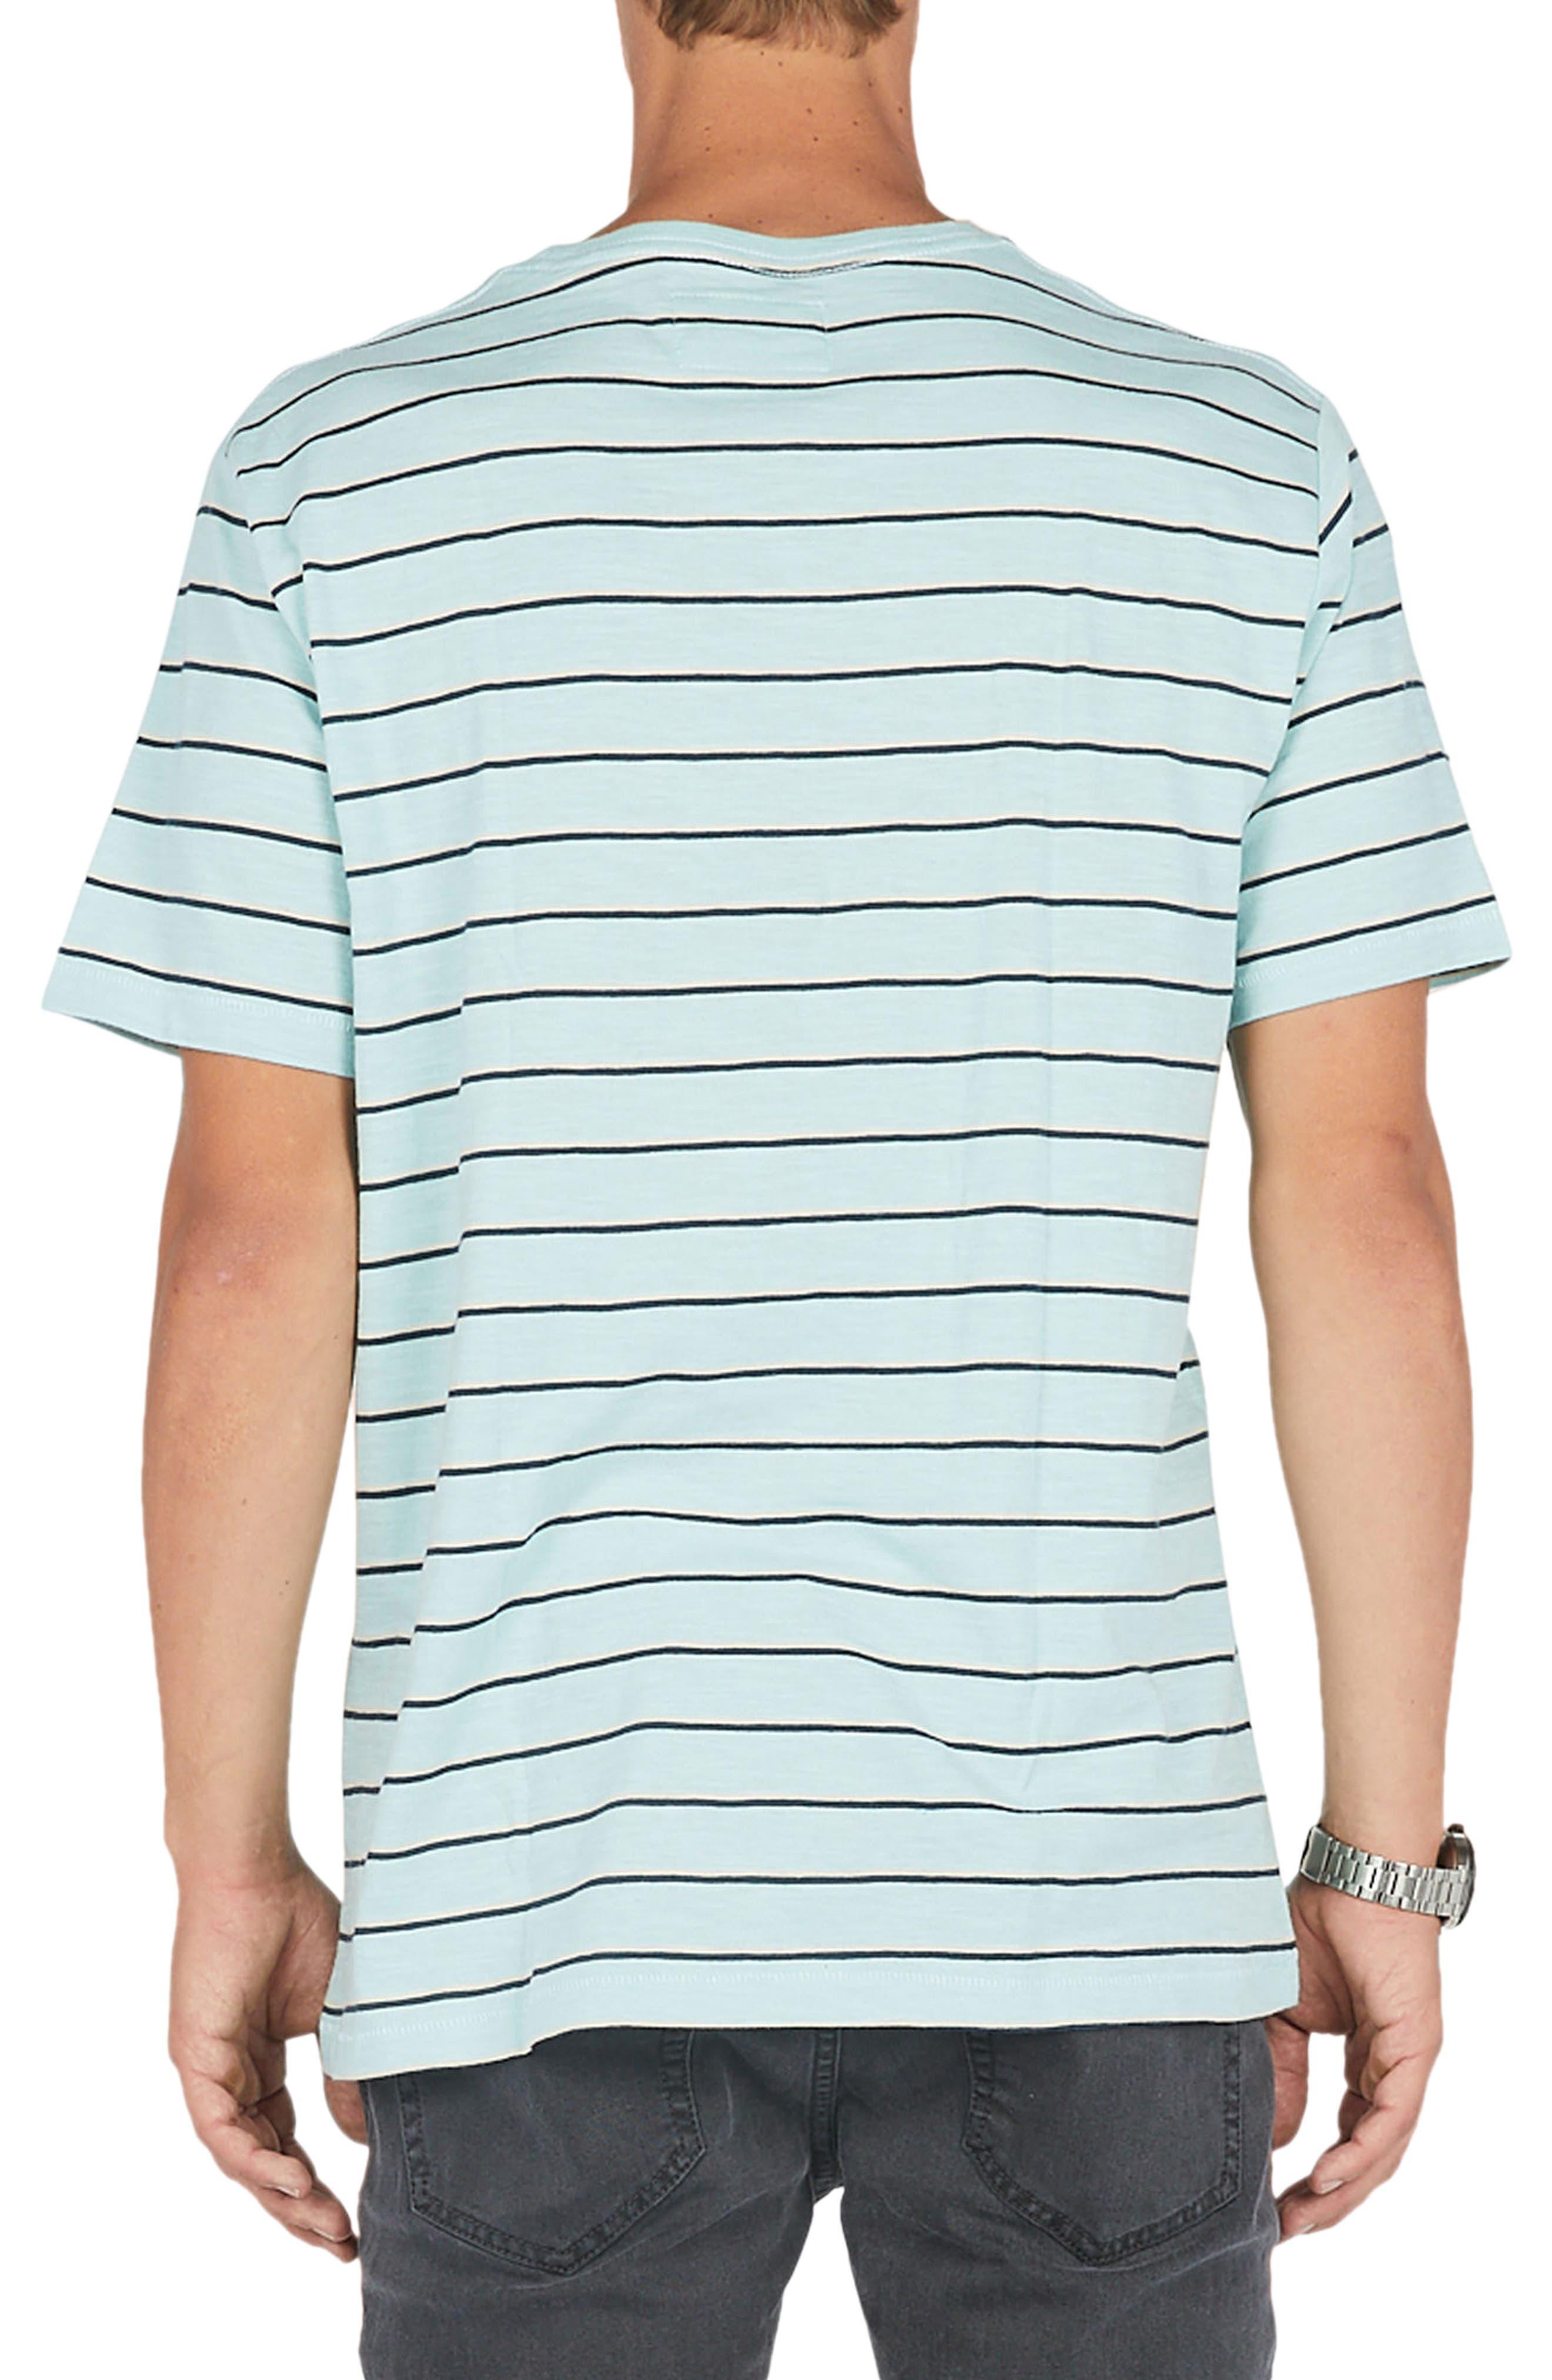 B.Schooled T-Shirt,                             Alternate thumbnail 2, color,                             400